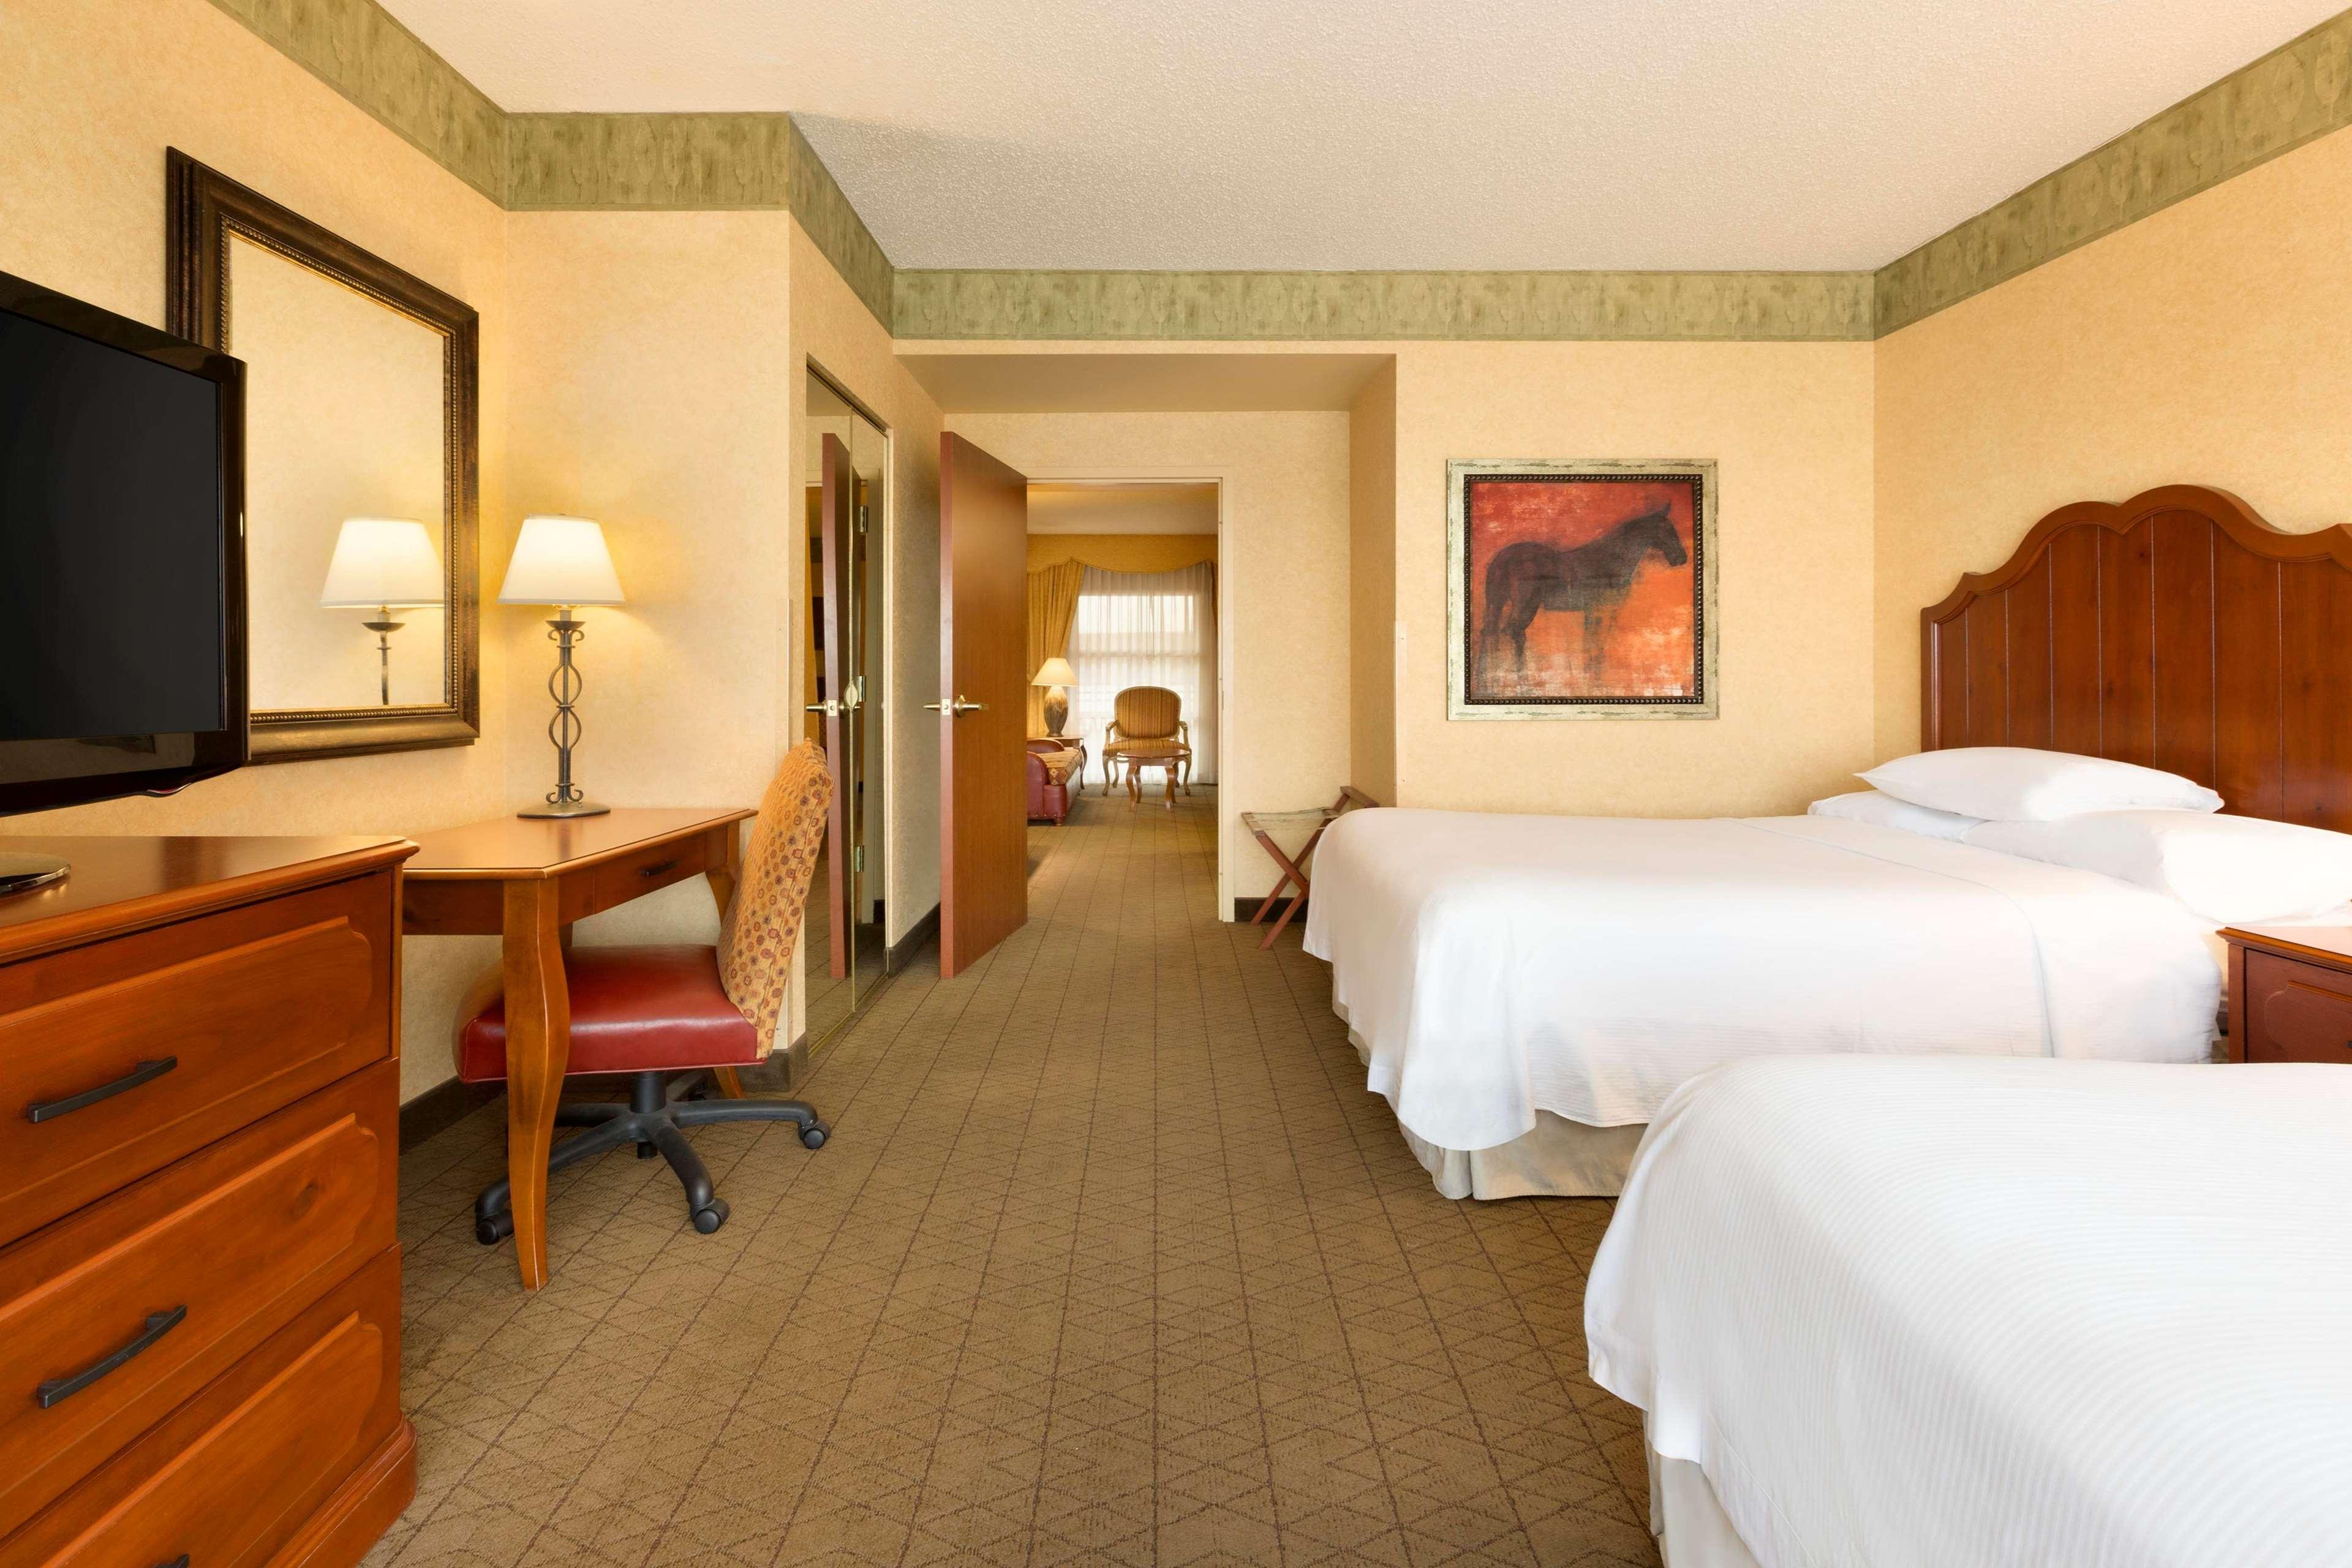 Embassy Suites by Hilton Albuquerque Hotel & Spa image 31